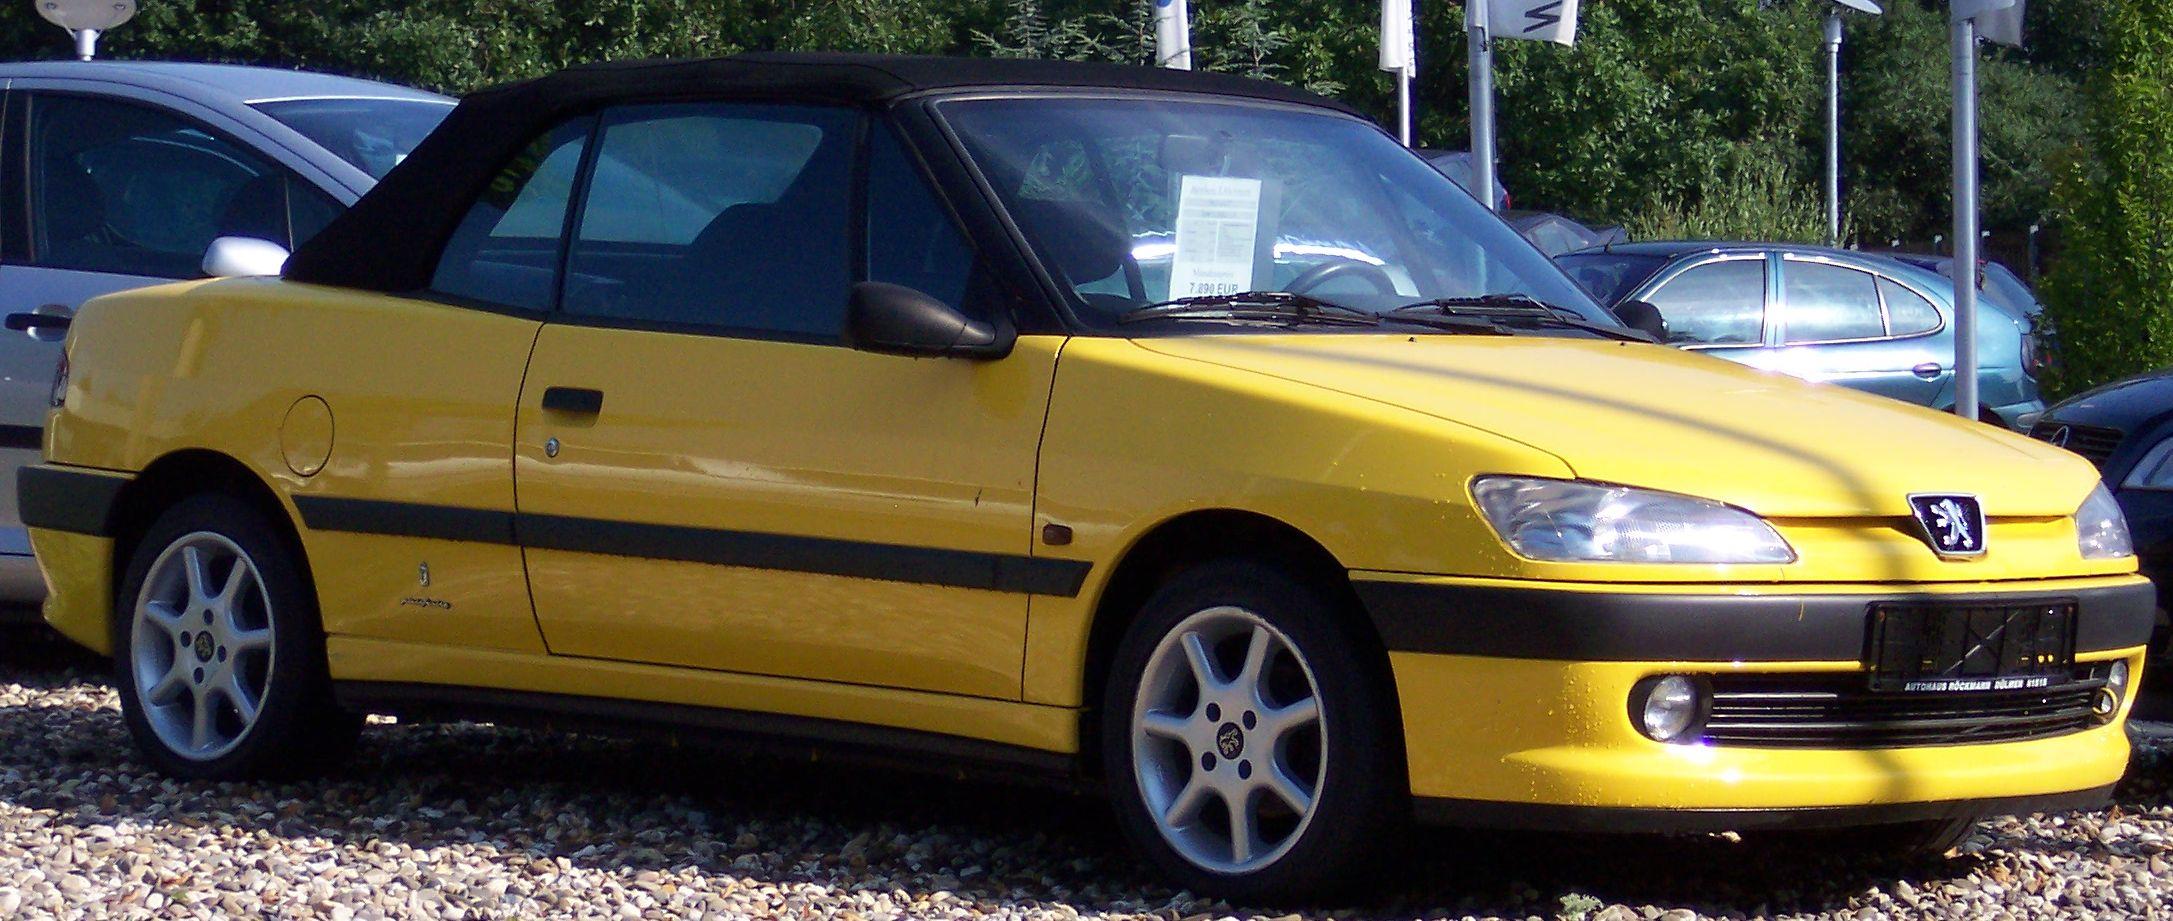 file peugeot 306 cabrio yellow wikipedia. Black Bedroom Furniture Sets. Home Design Ideas